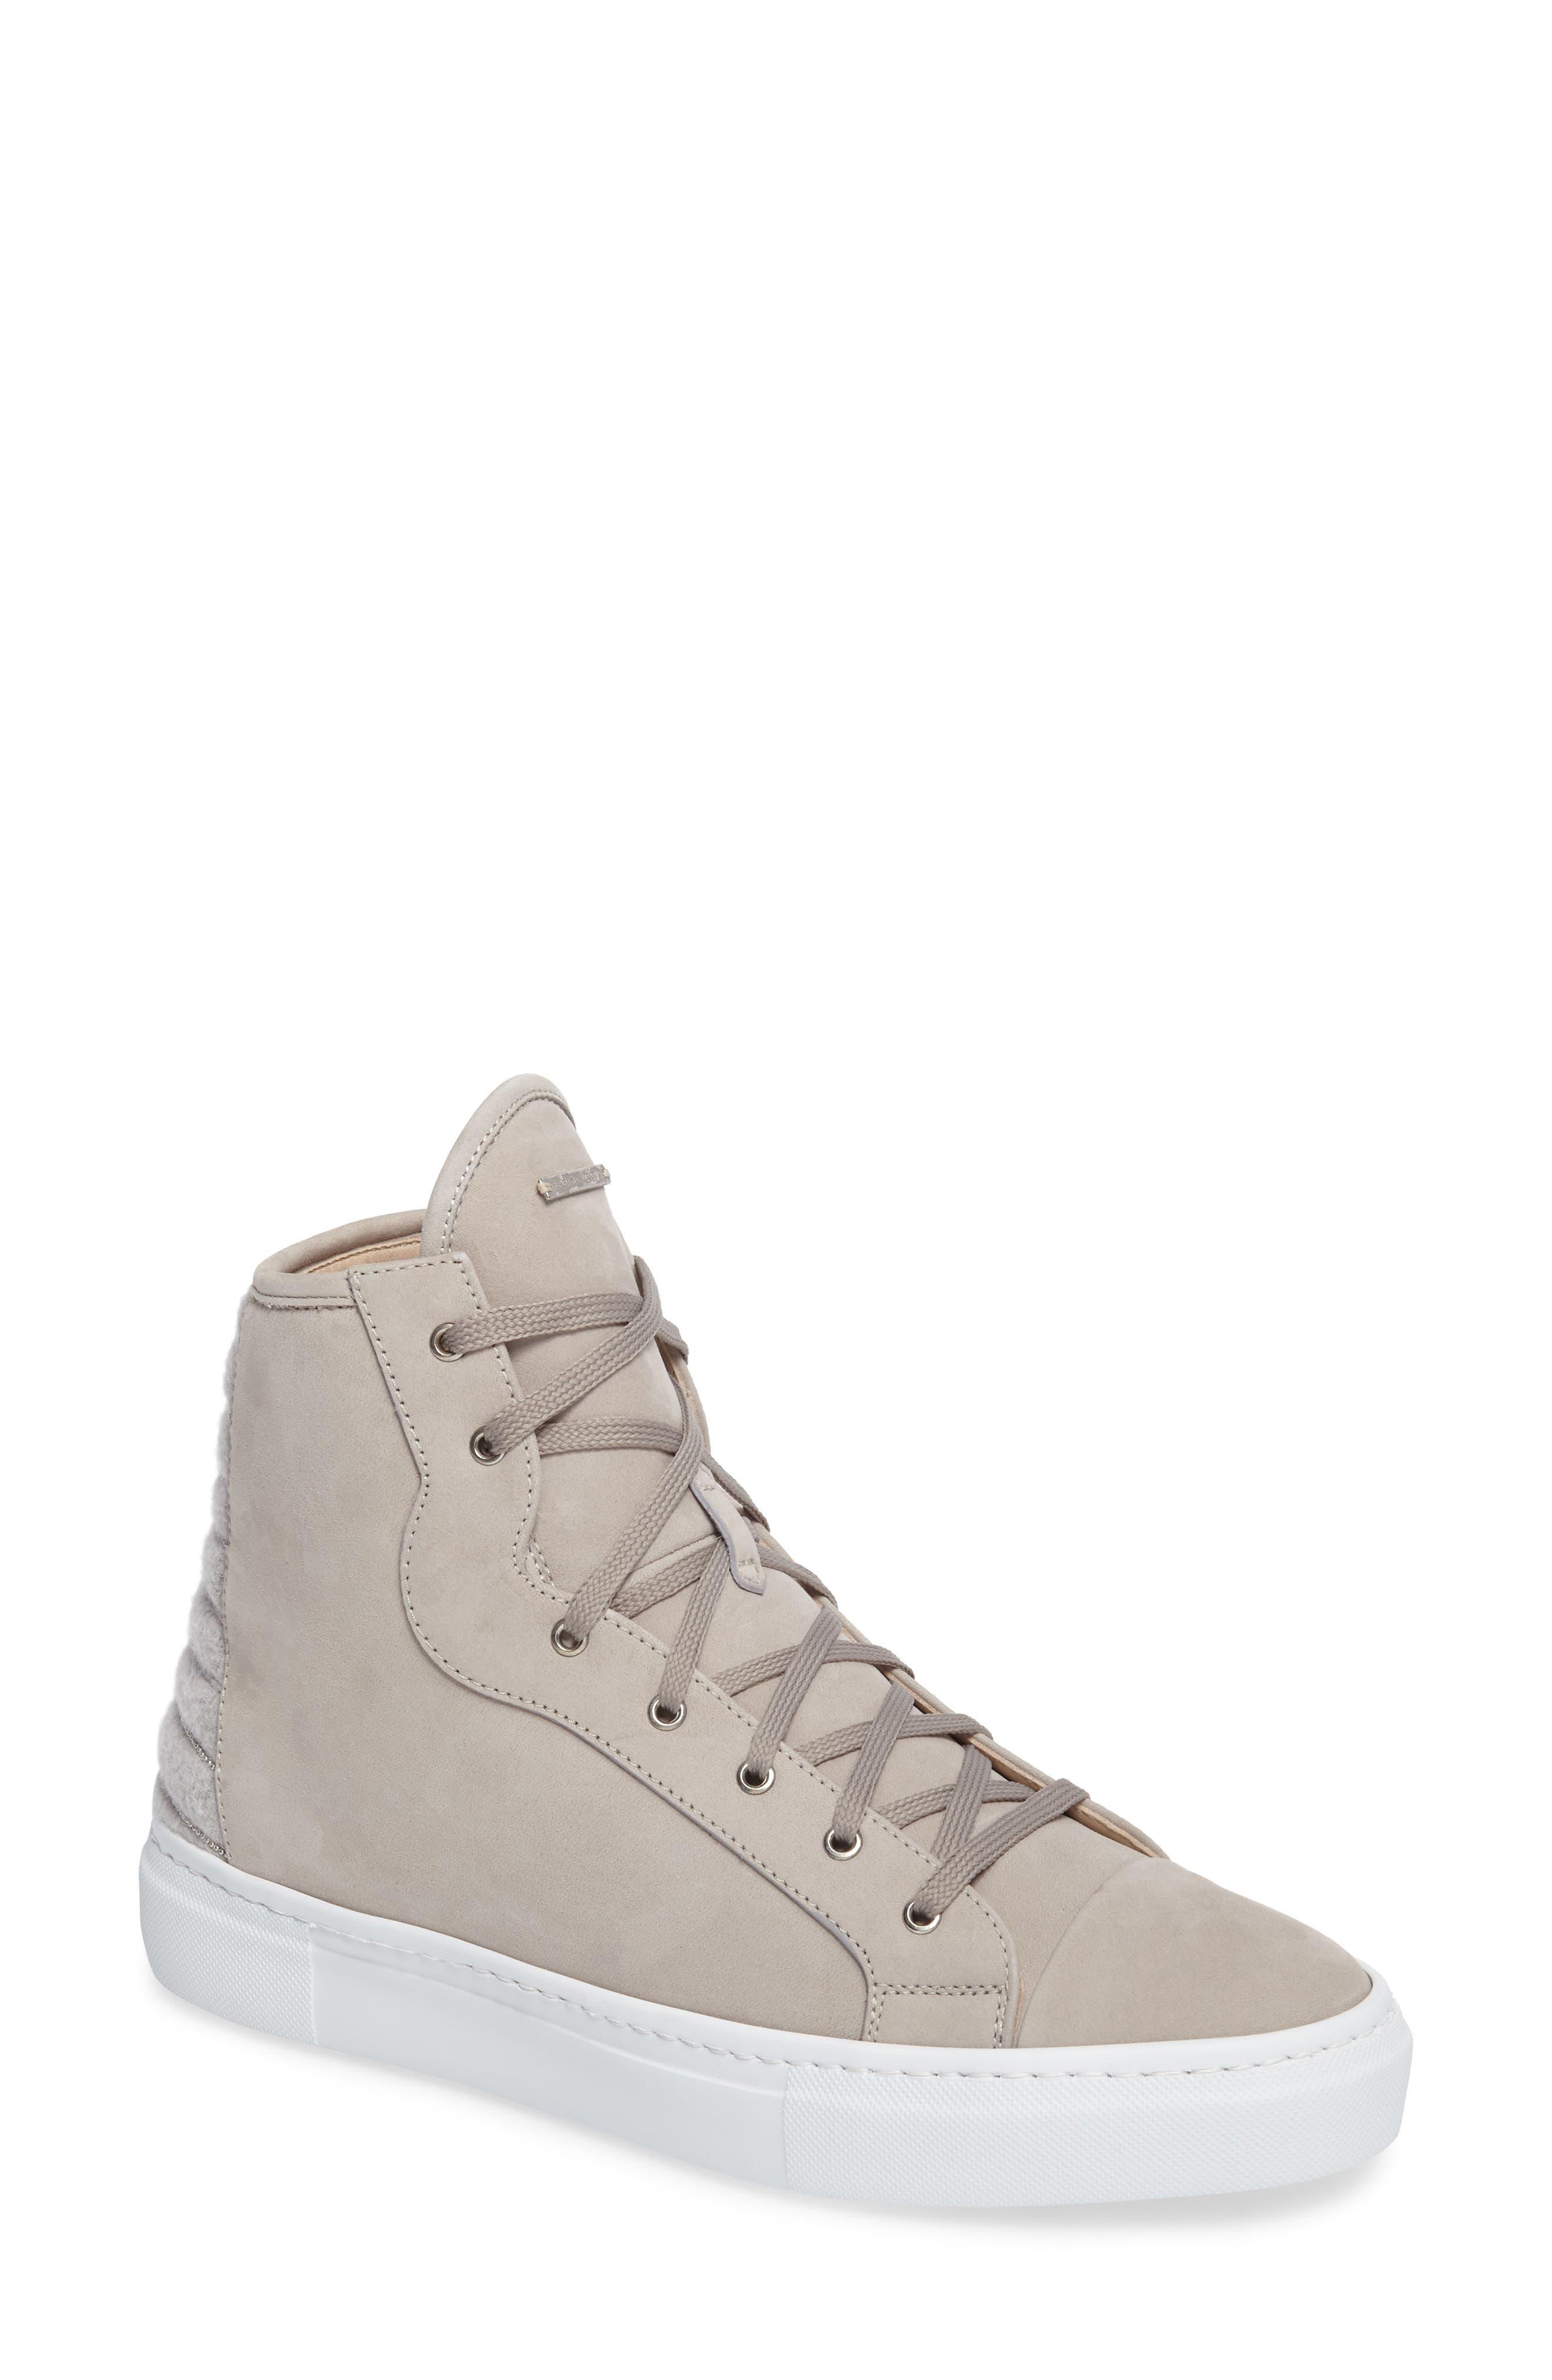 Eva High Top Sneaker,                             Main thumbnail 1, color,                             250